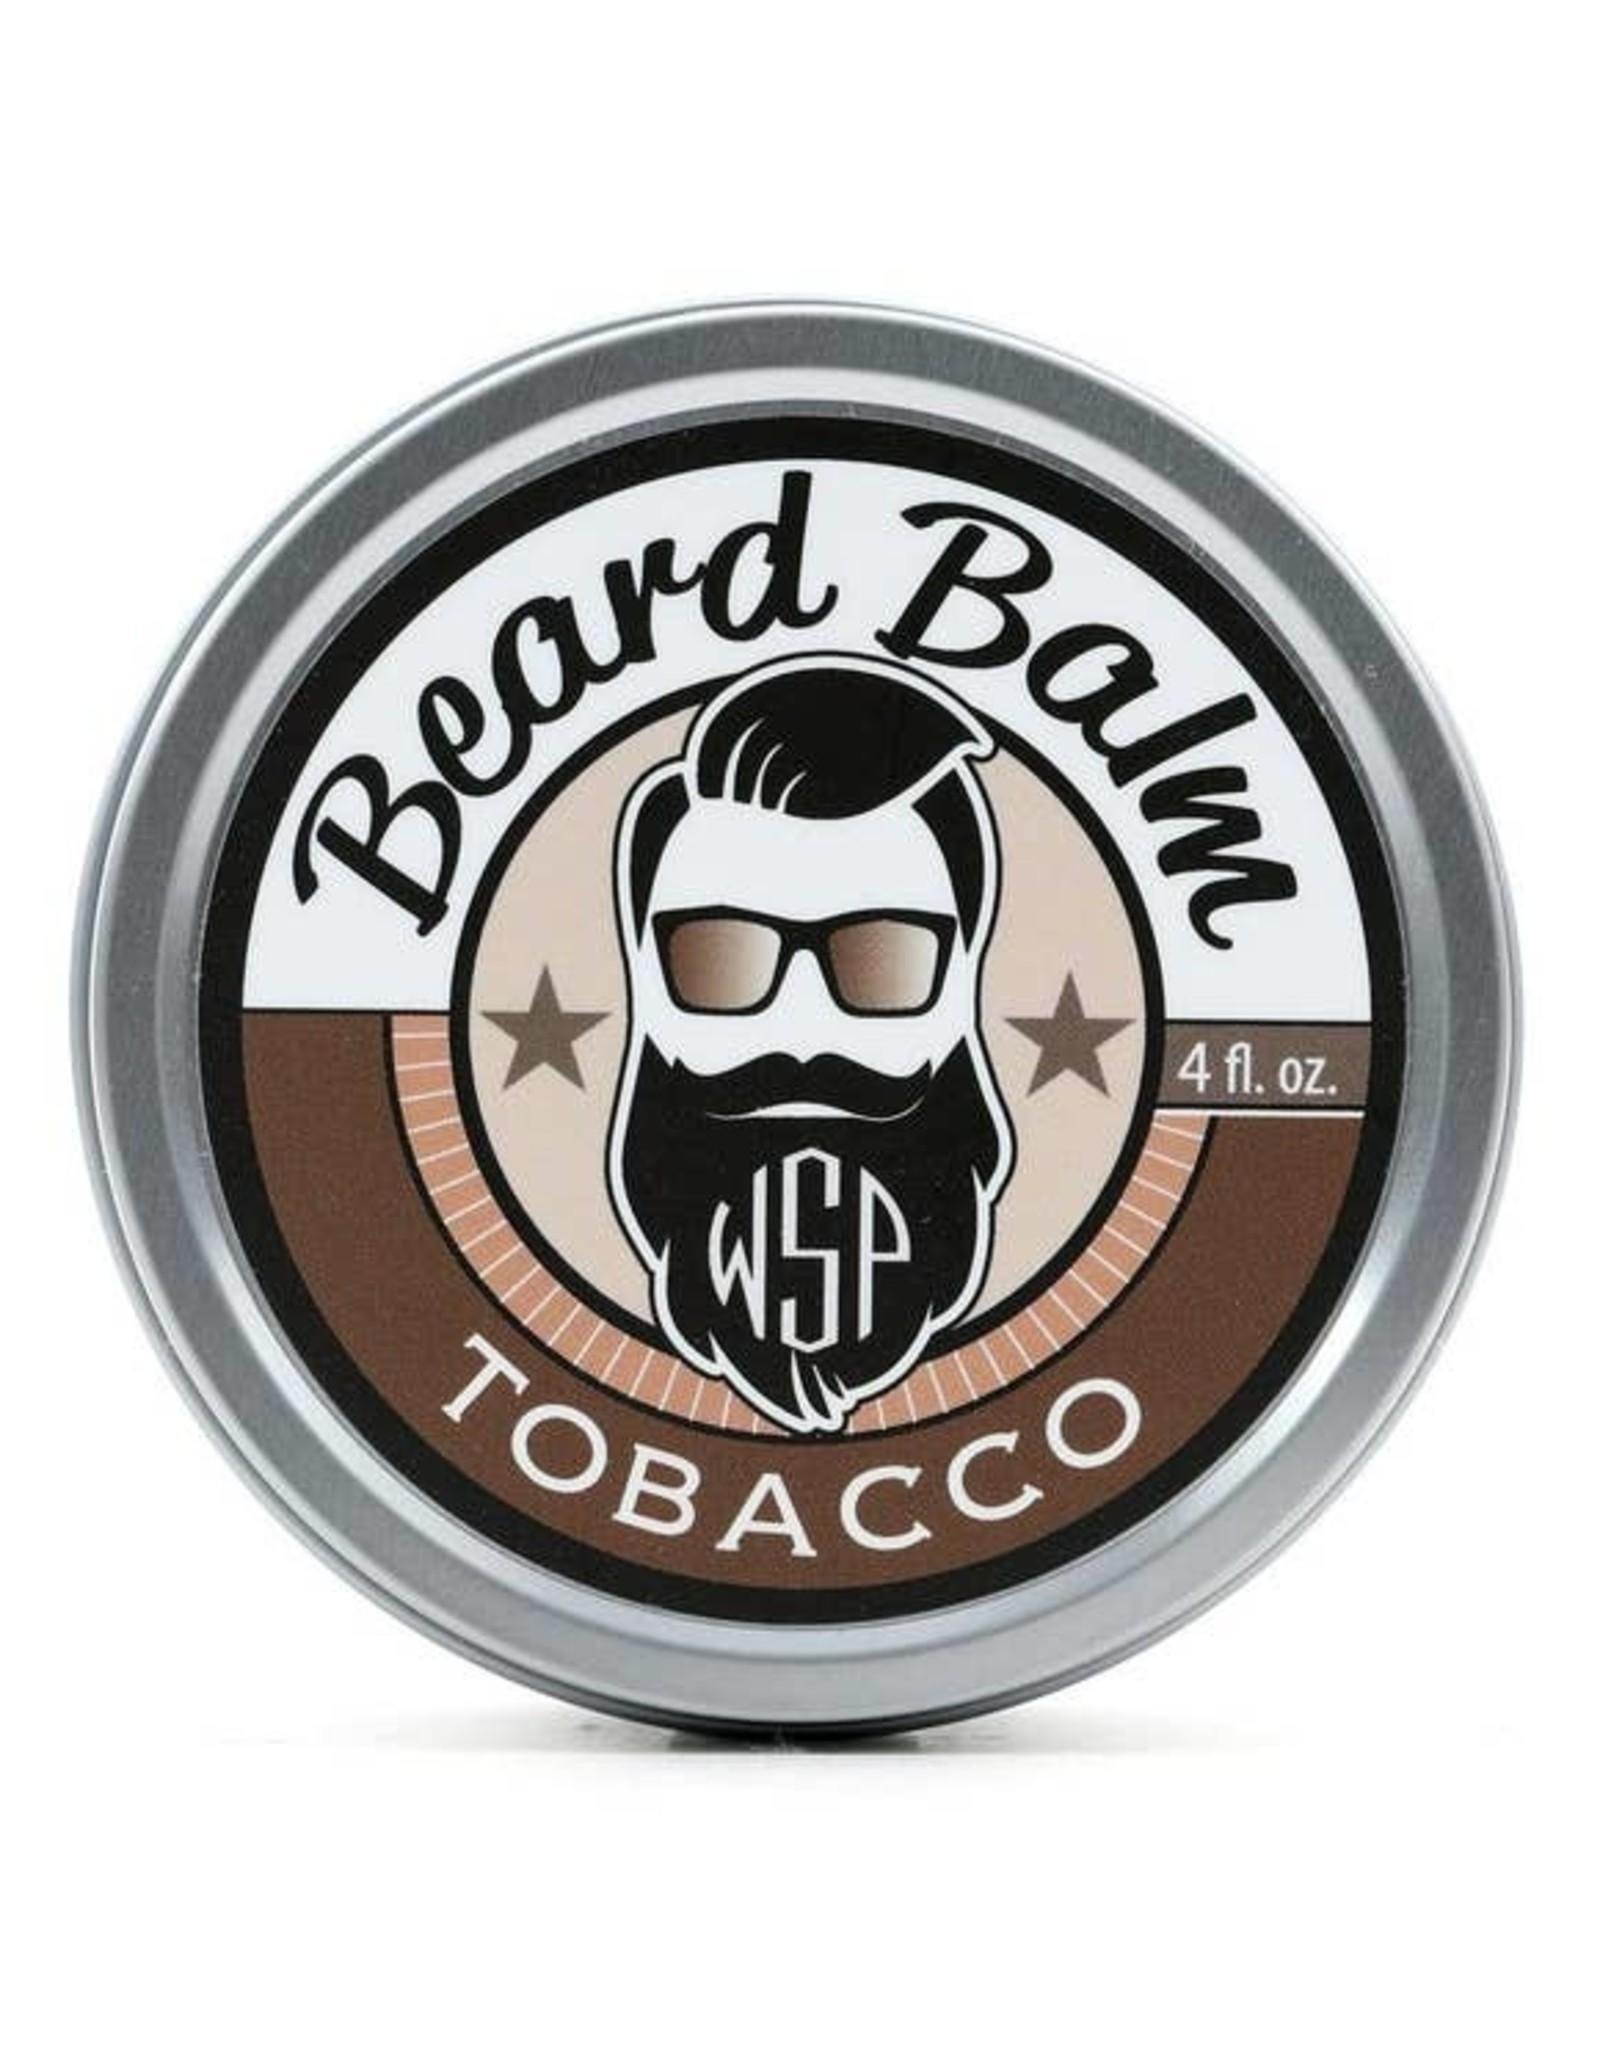 Wet Shaving Products Beard Balm 1 oz.   Tobacco